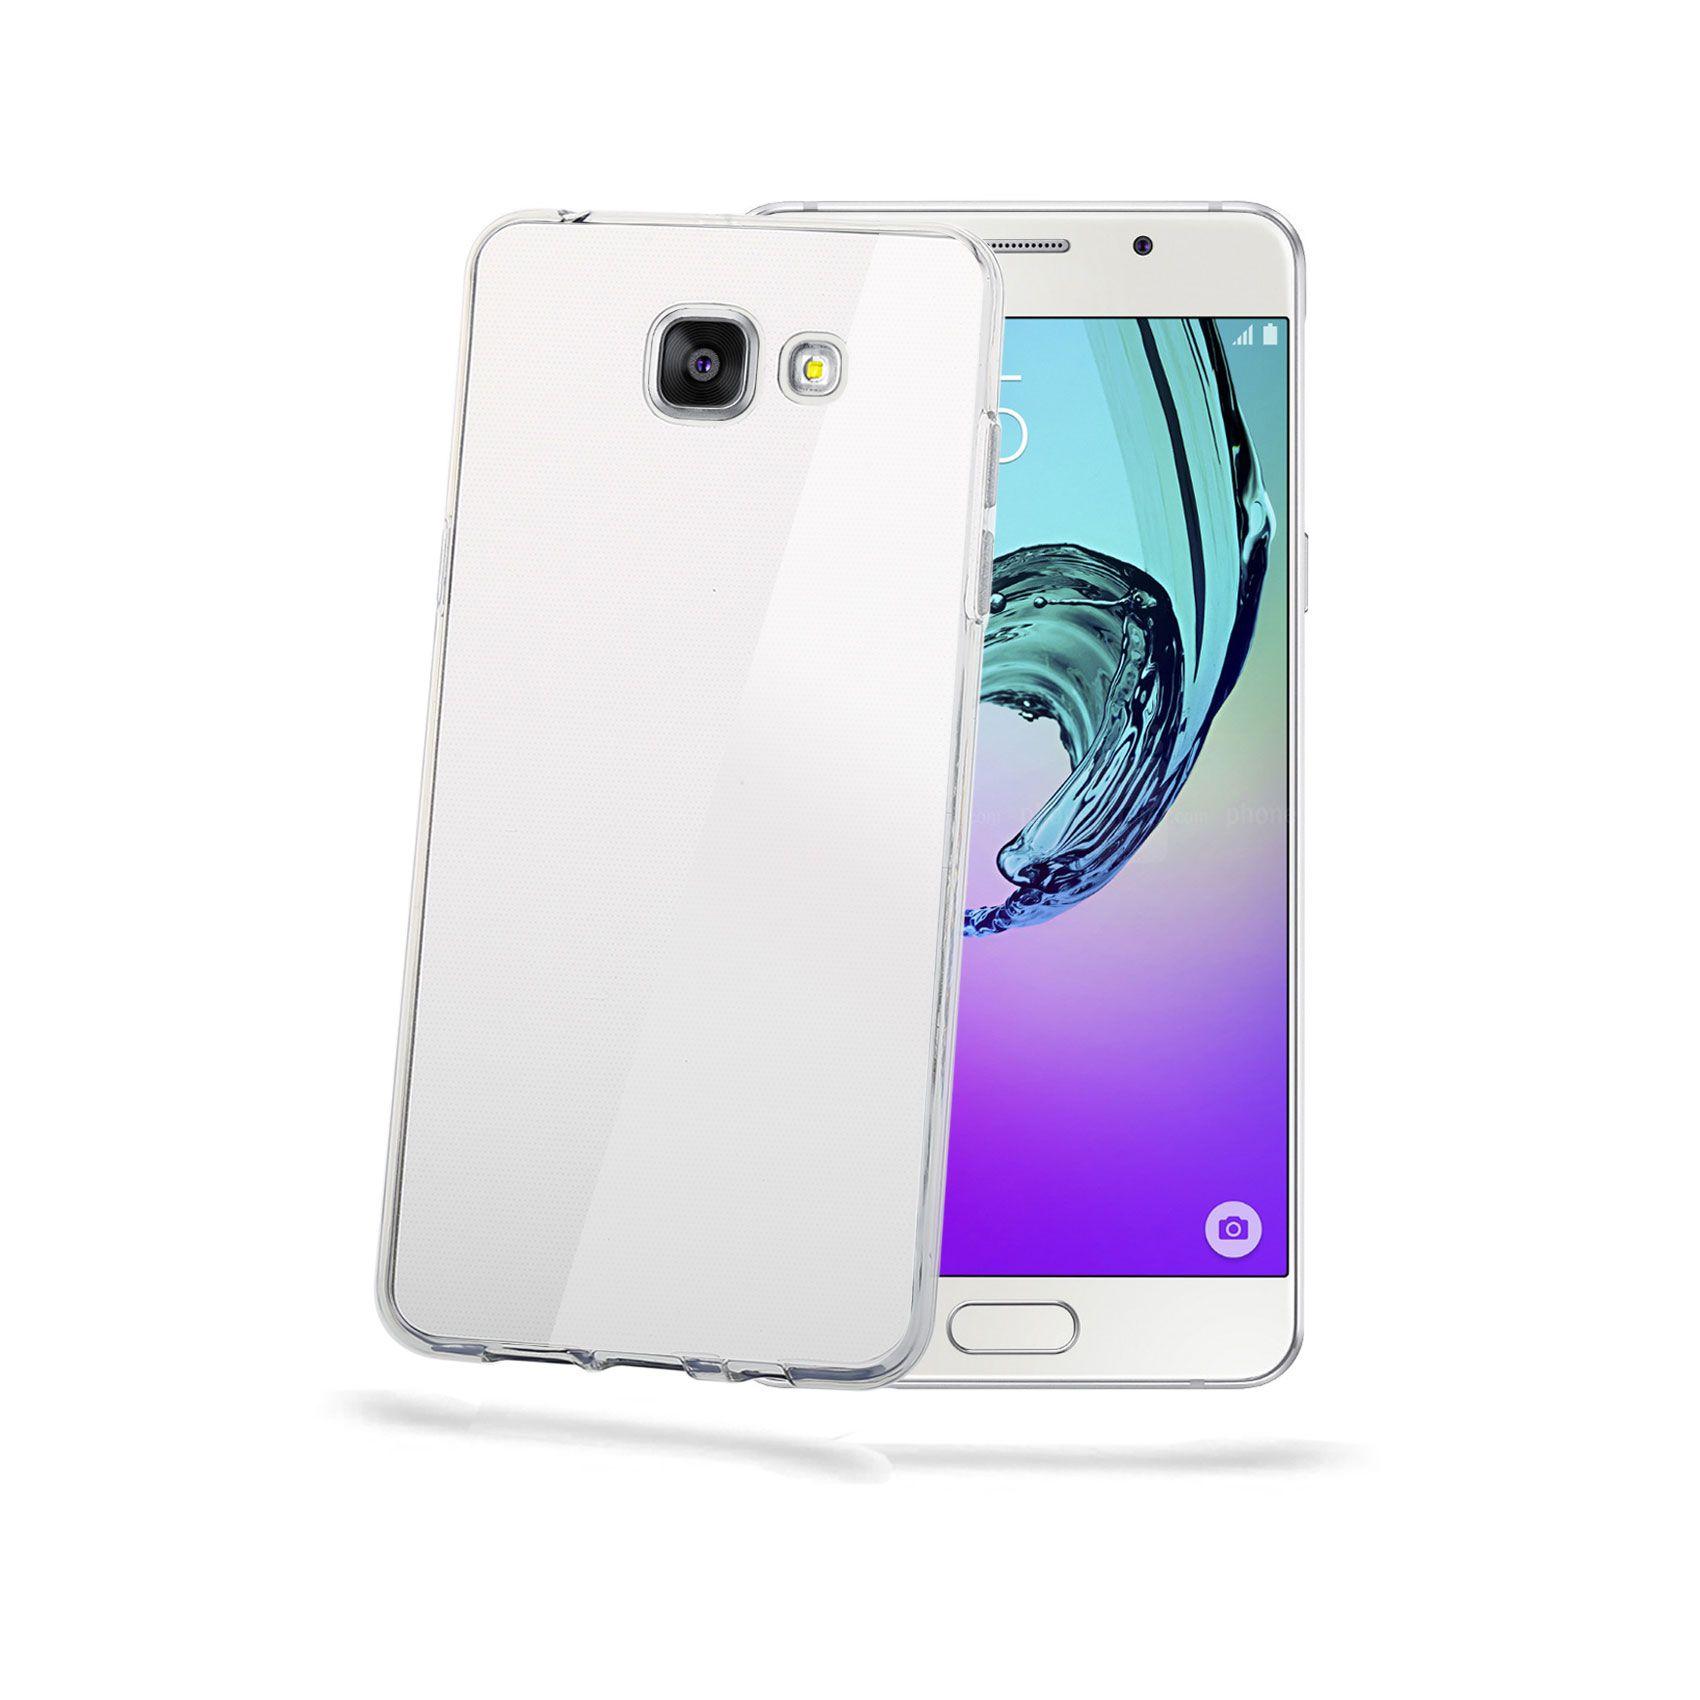 TPU pouzdro CELLY Gelskin pro Samsung Galaxy A5 (2017), bezbarvé